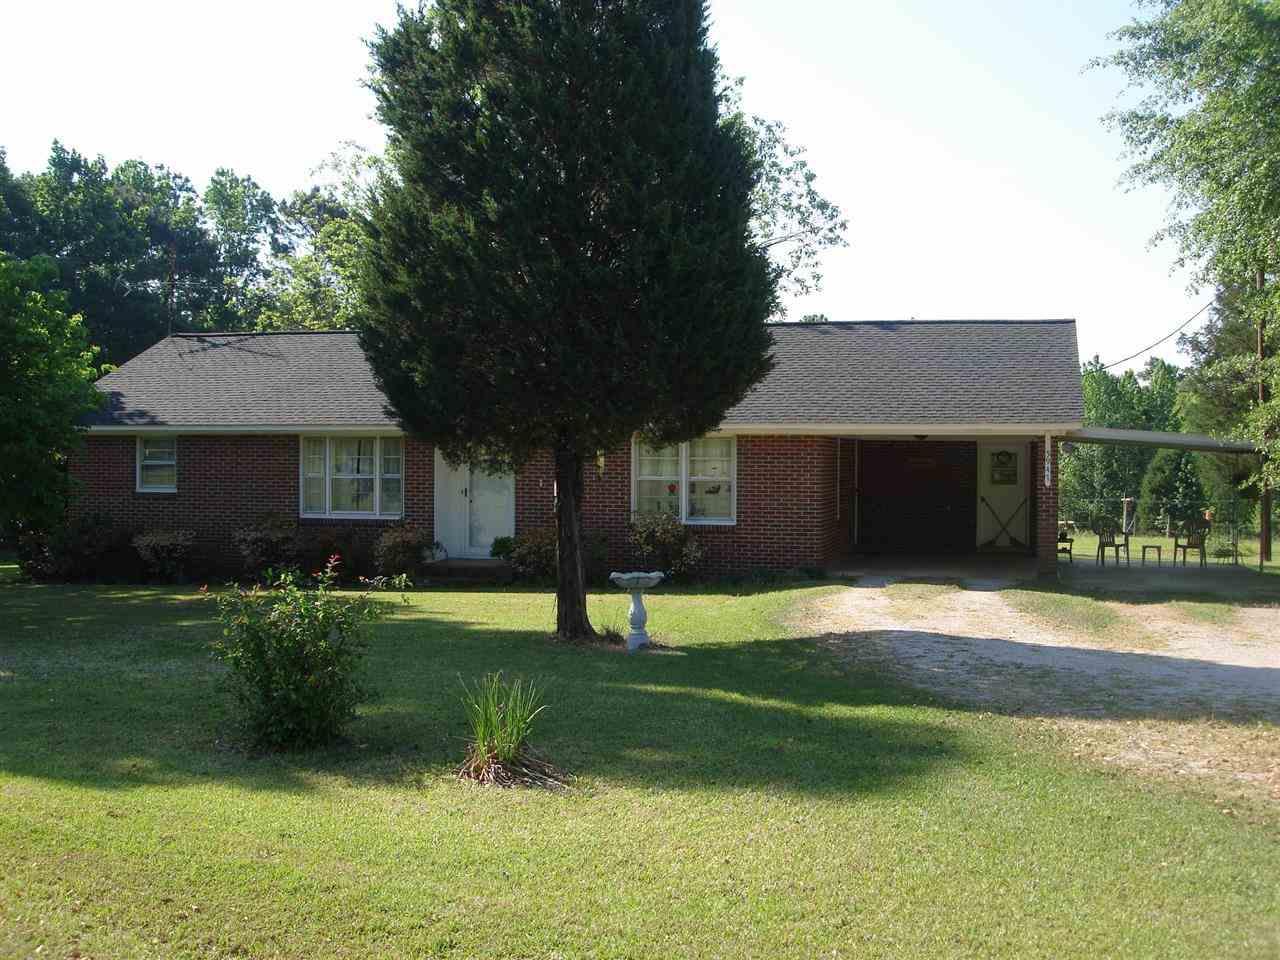 Real Estate for Sale, ListingId: 30049629, Kershaw,SC29067